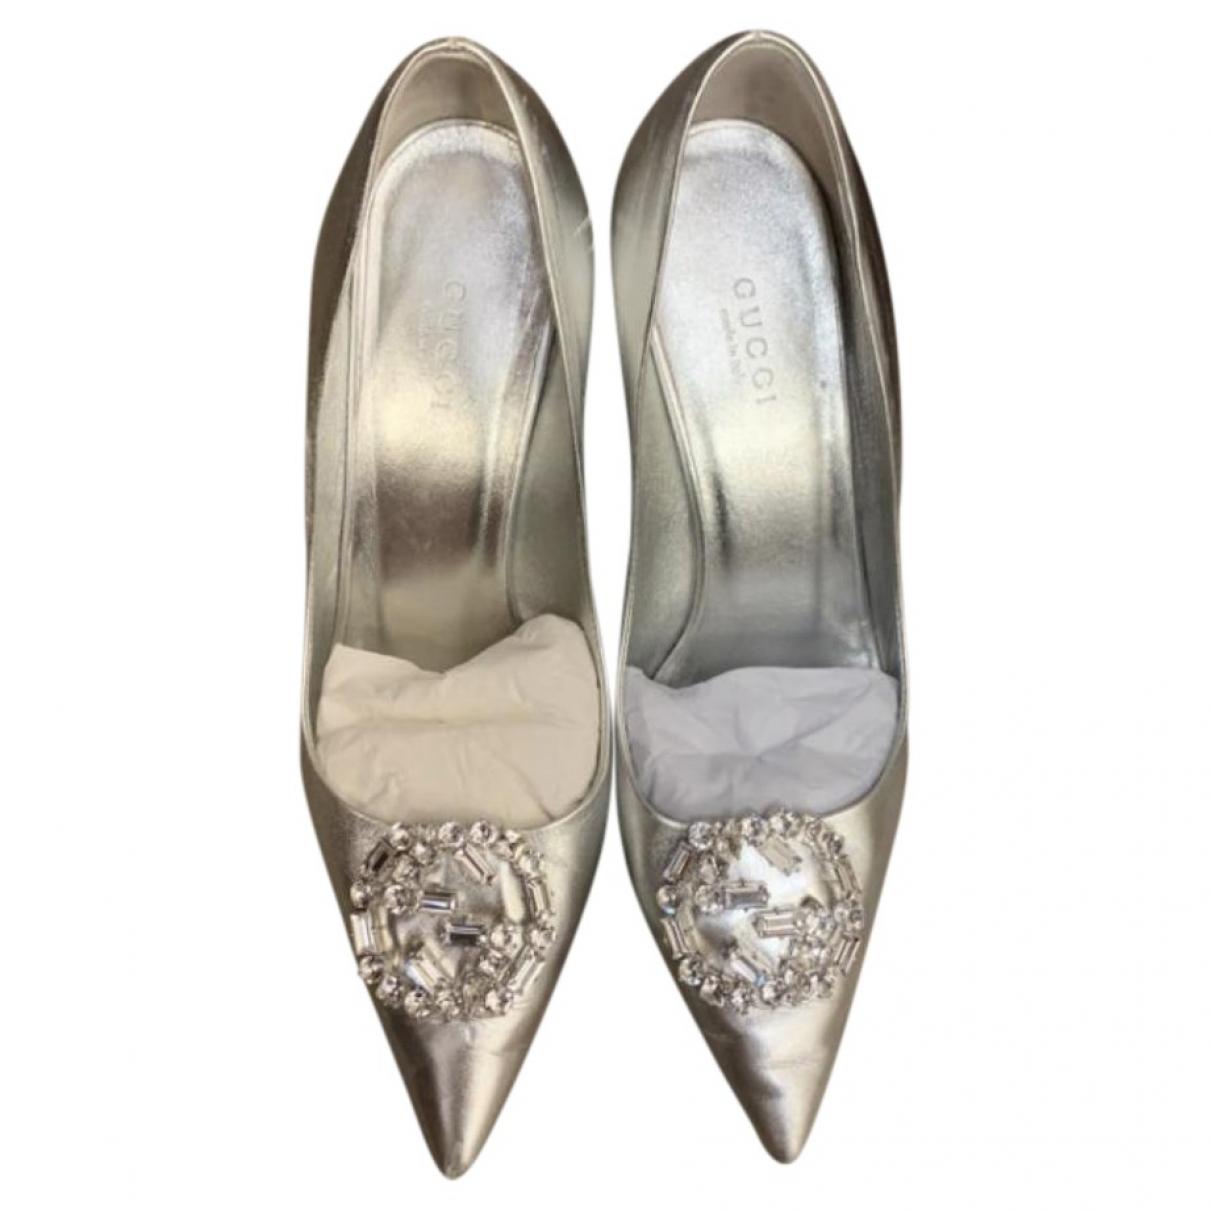 Gucci \N Silver Leather Heels for Women 36 EU